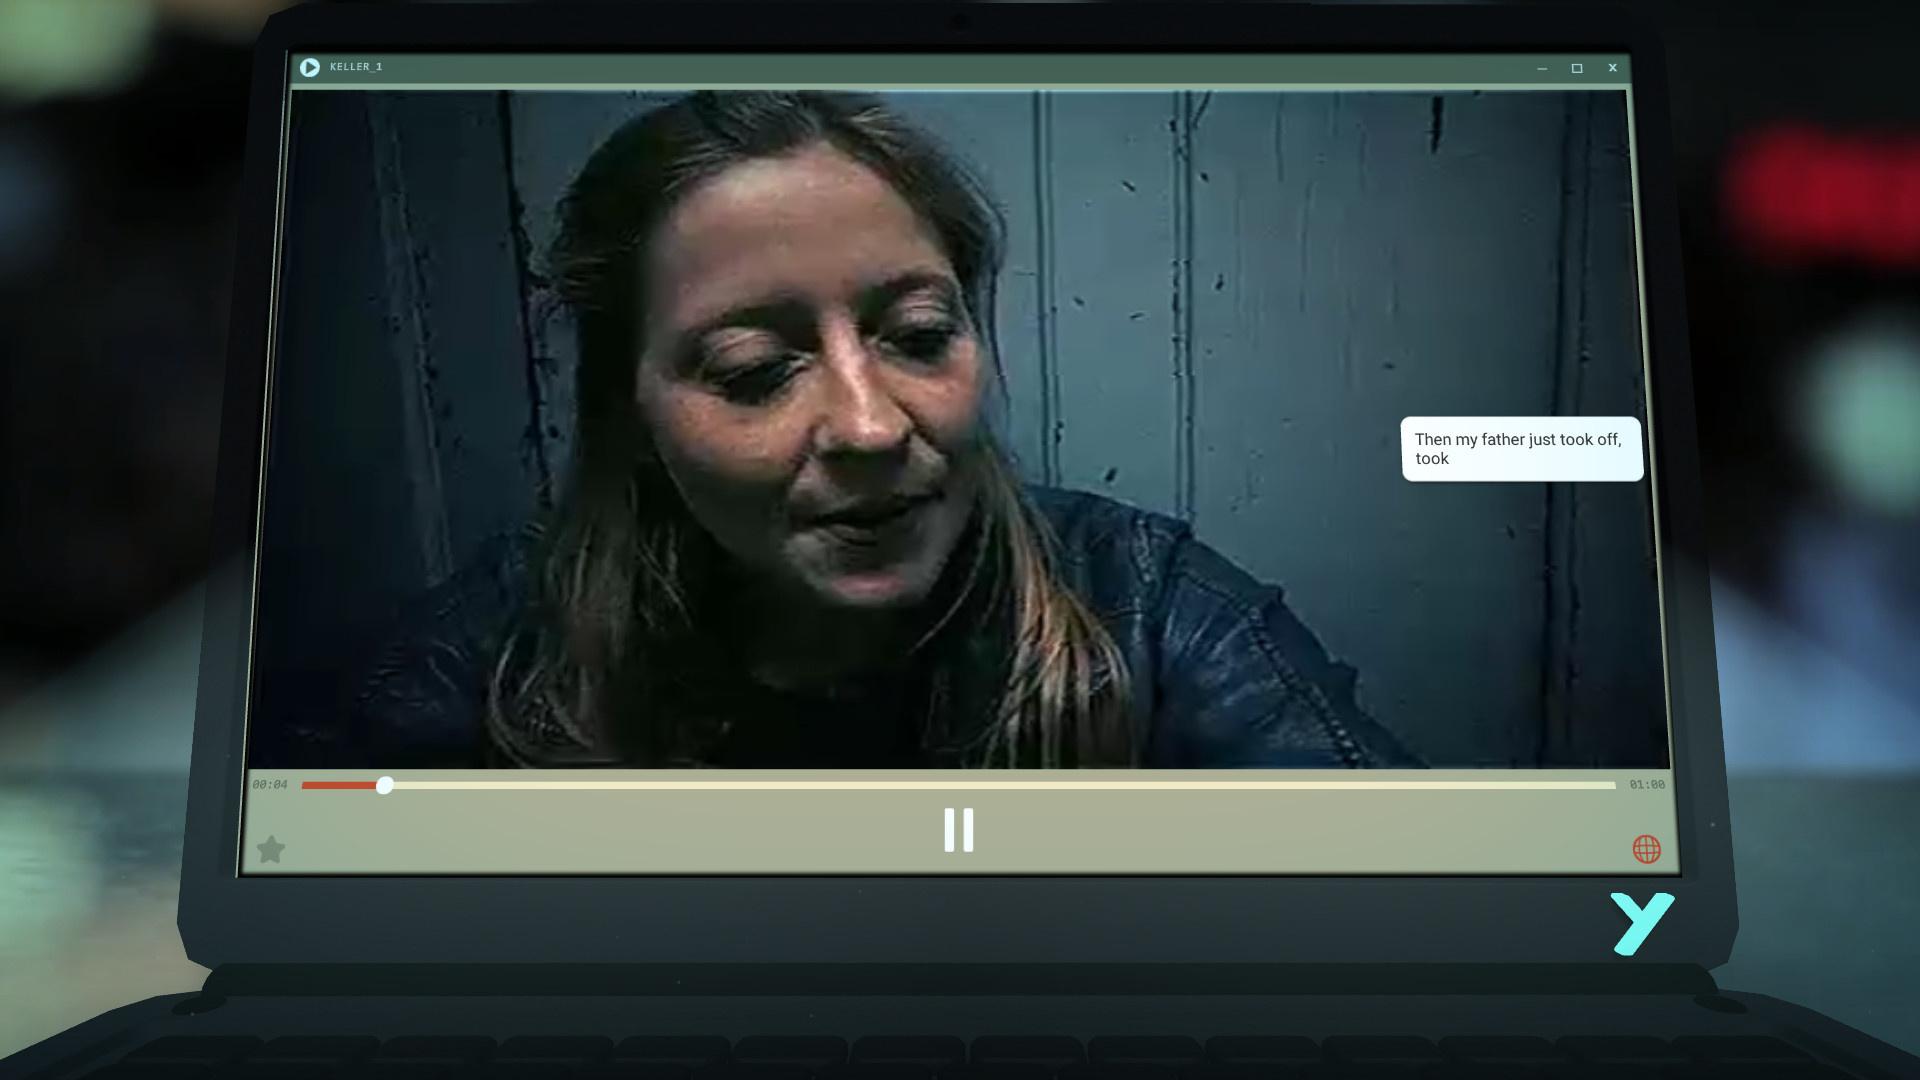 Детективное FMV-приключение Jessika выходит в Steam25 августа